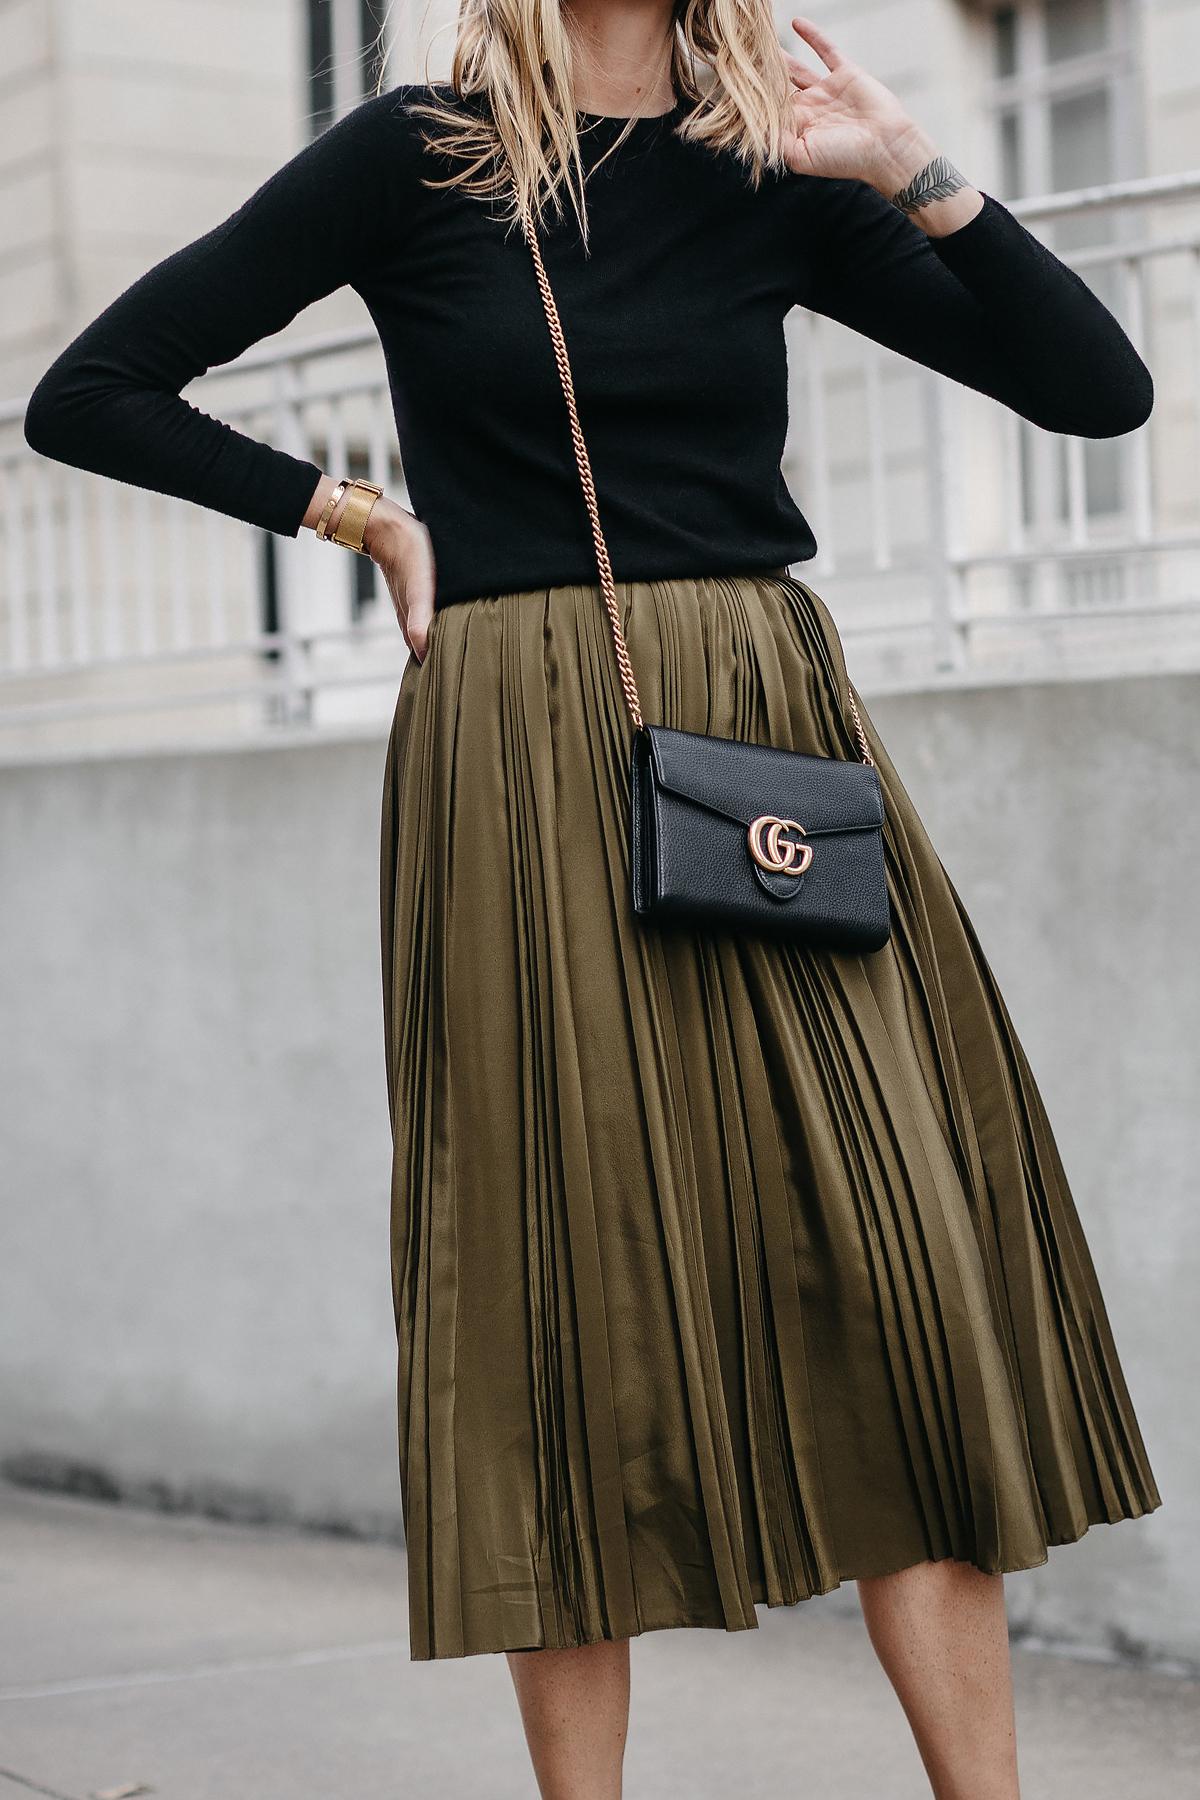 Black Sweater Robert Rodriguez Green Pleated Midi Skirt Gucci Marmont Handbag Fashion Jackson Dallas Blogger Fashion Blogger Street Style